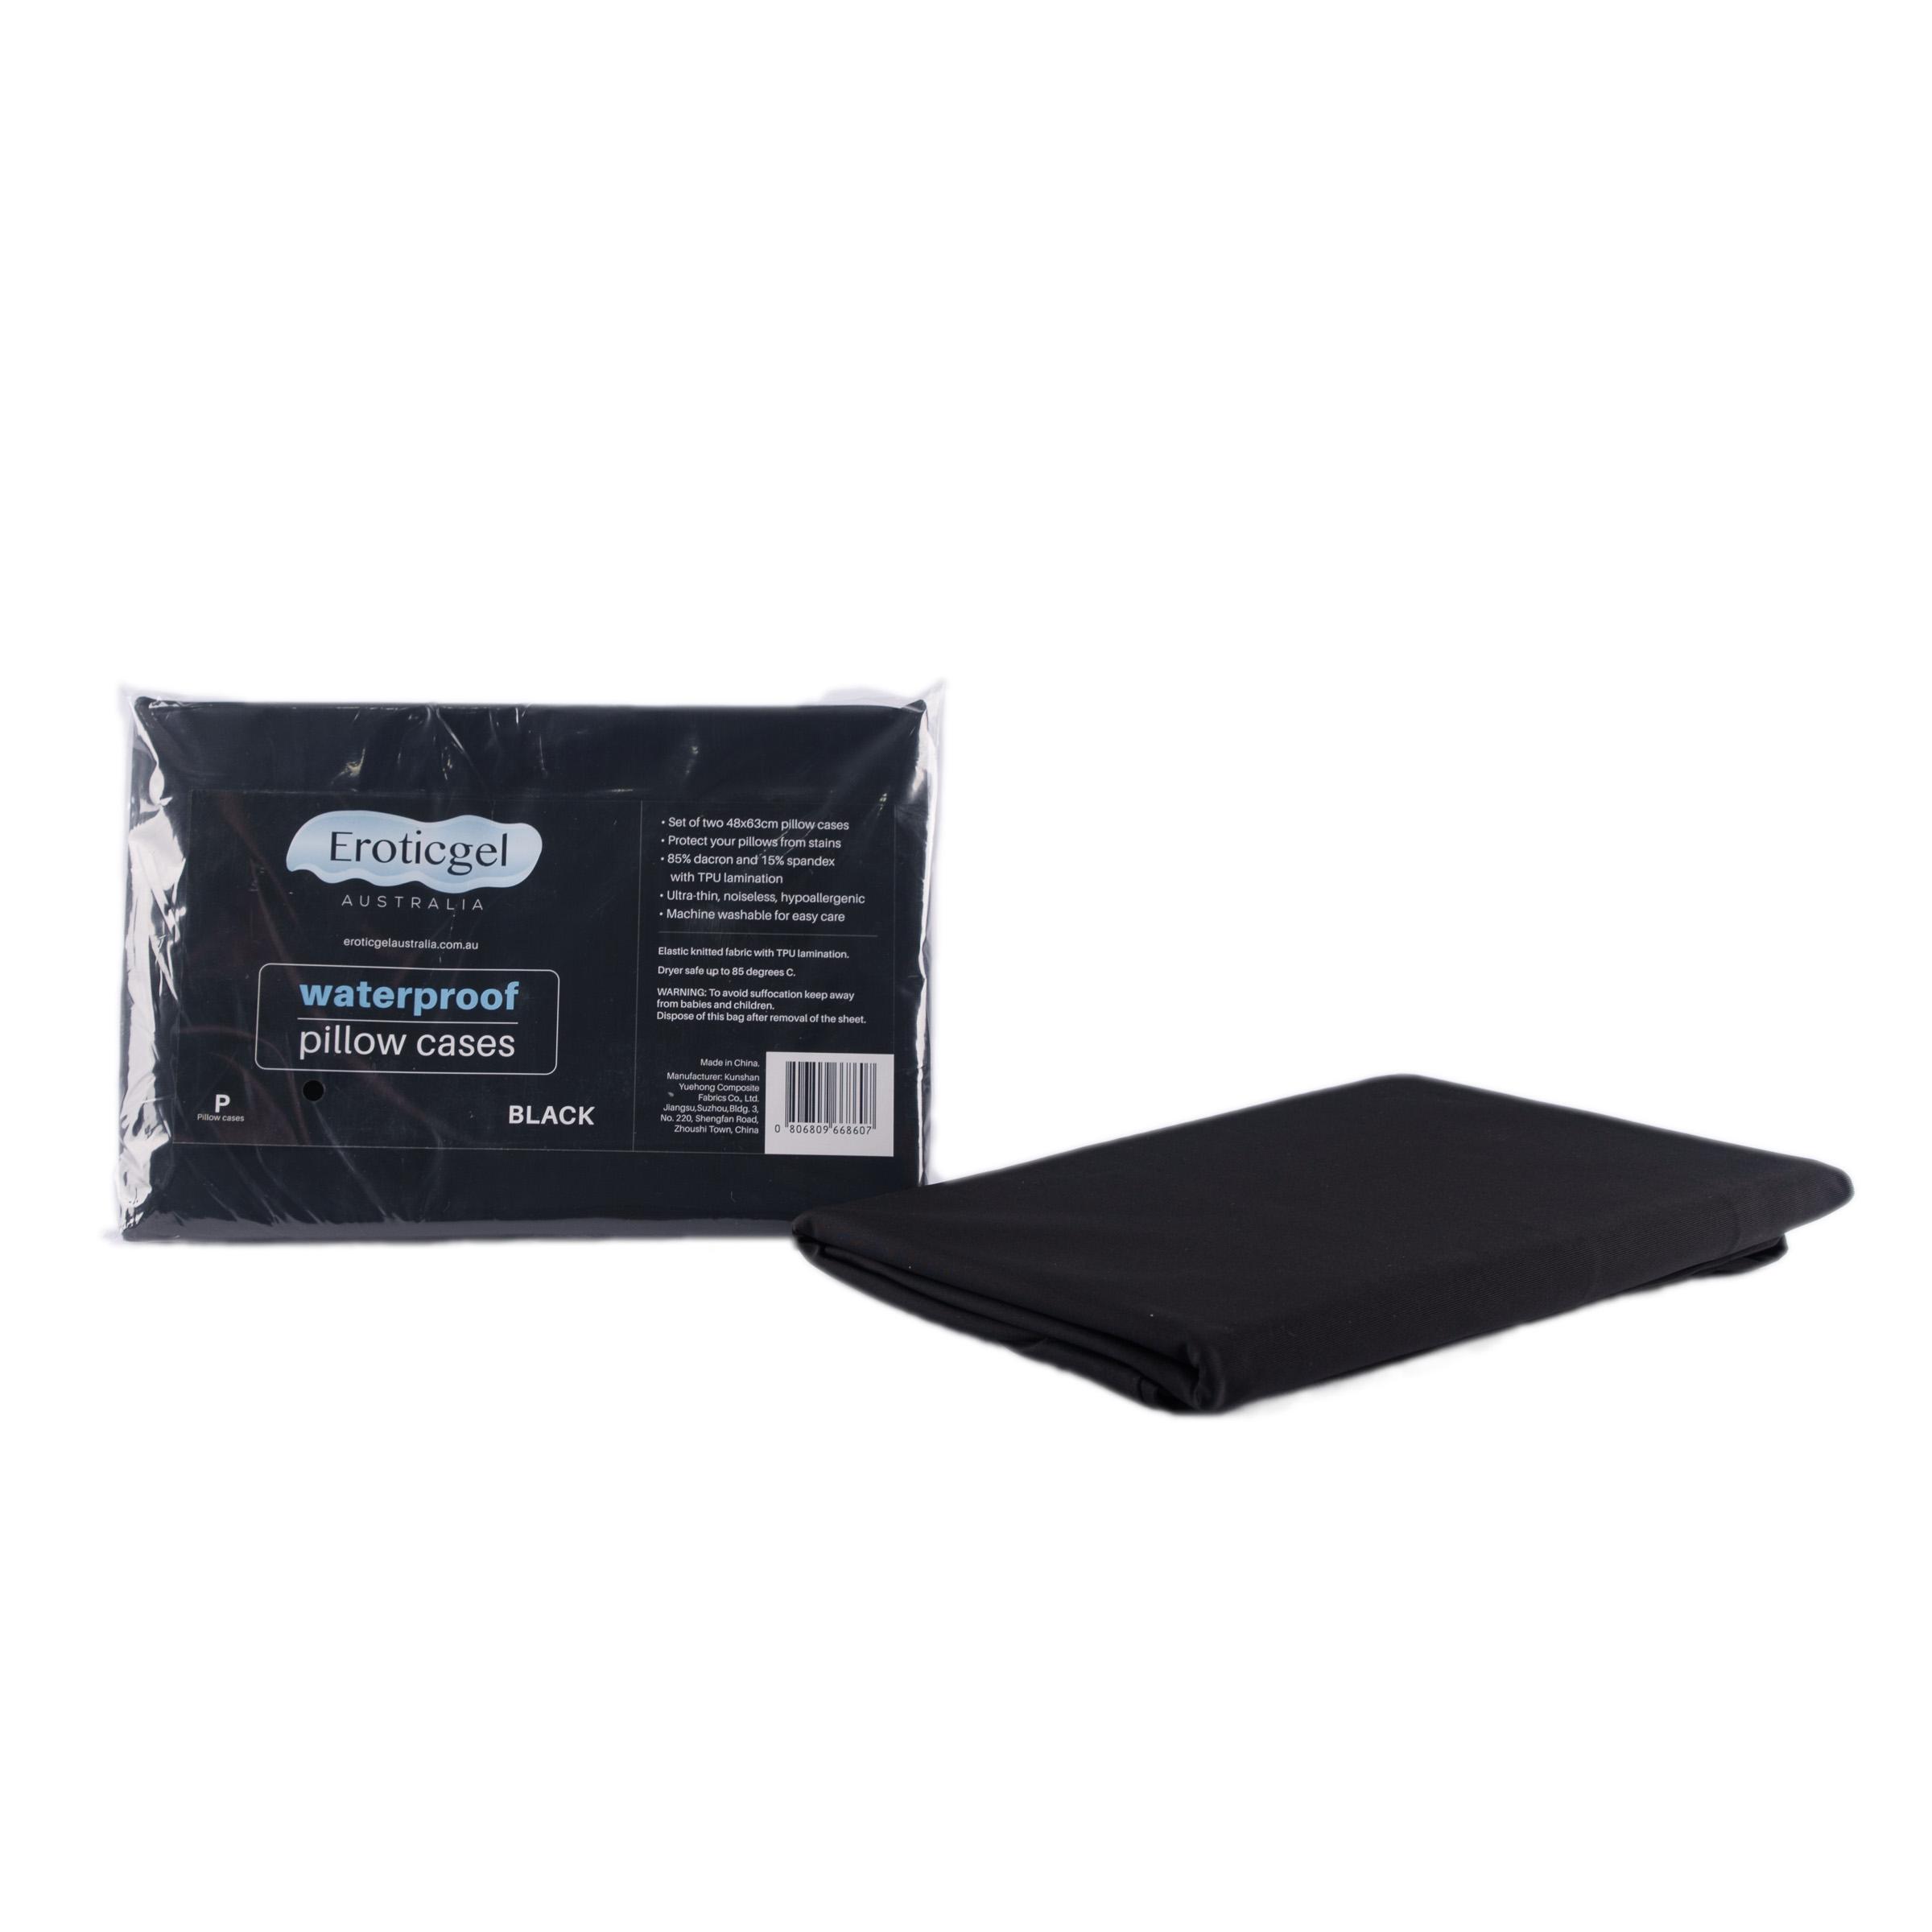 Eroticgel Australia Black Waterproof Fitted Sheet Pillow Case